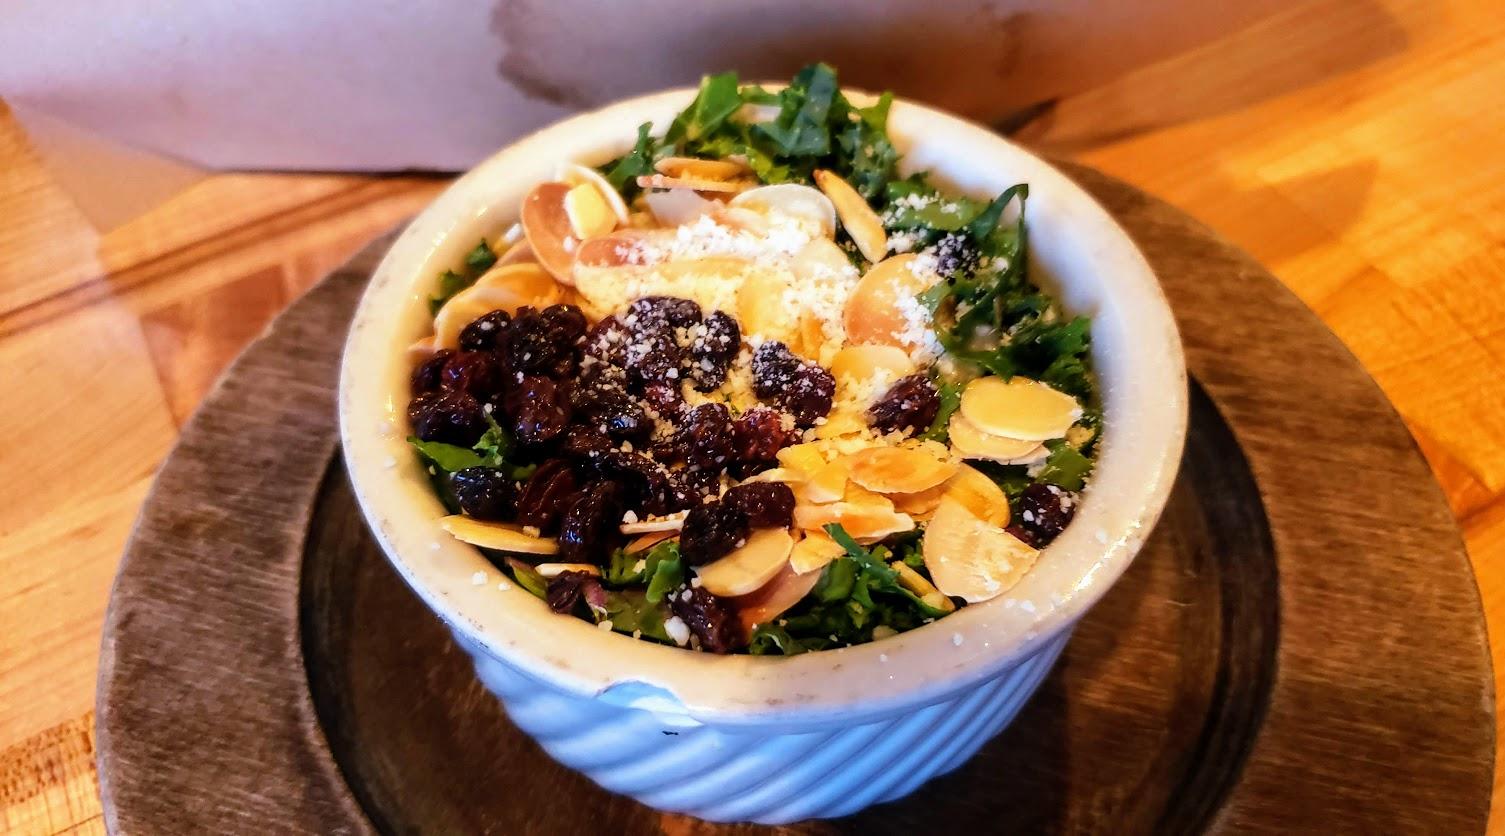 Merle's KY Kale Salad (half sized version)